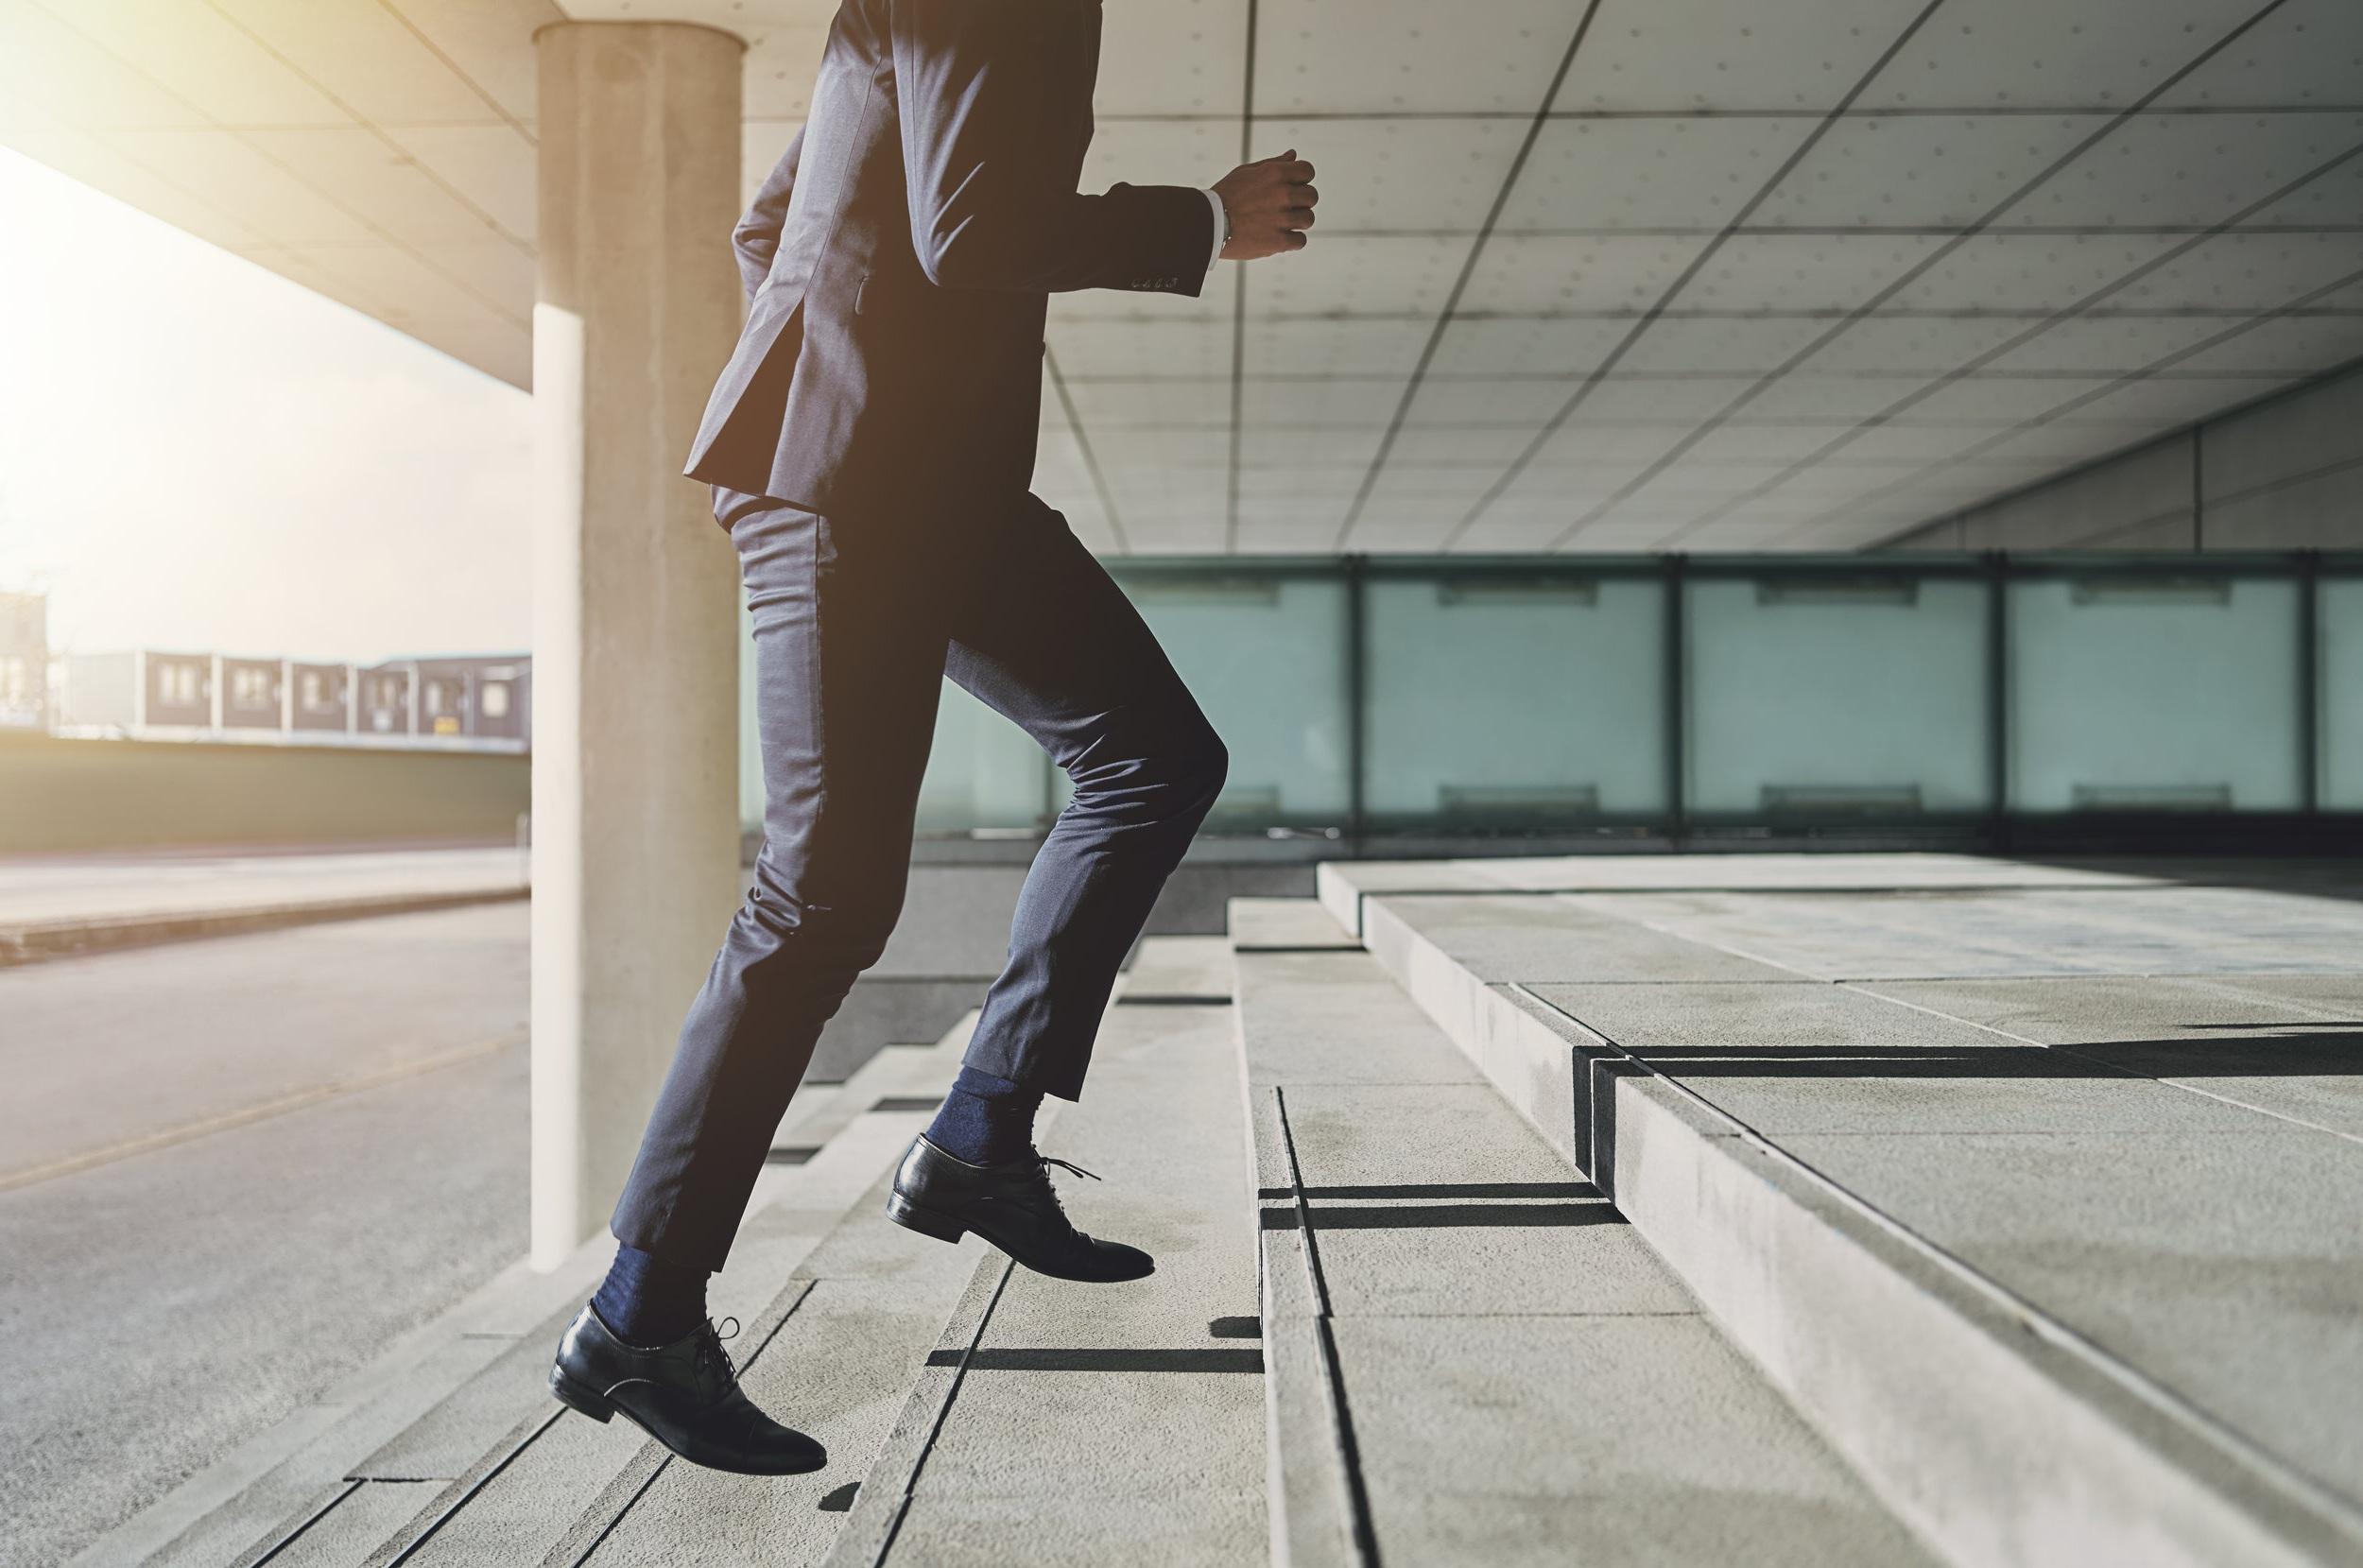 shutterstock_steps_step_by_step_progress_forward_stairs_519567250.jpg